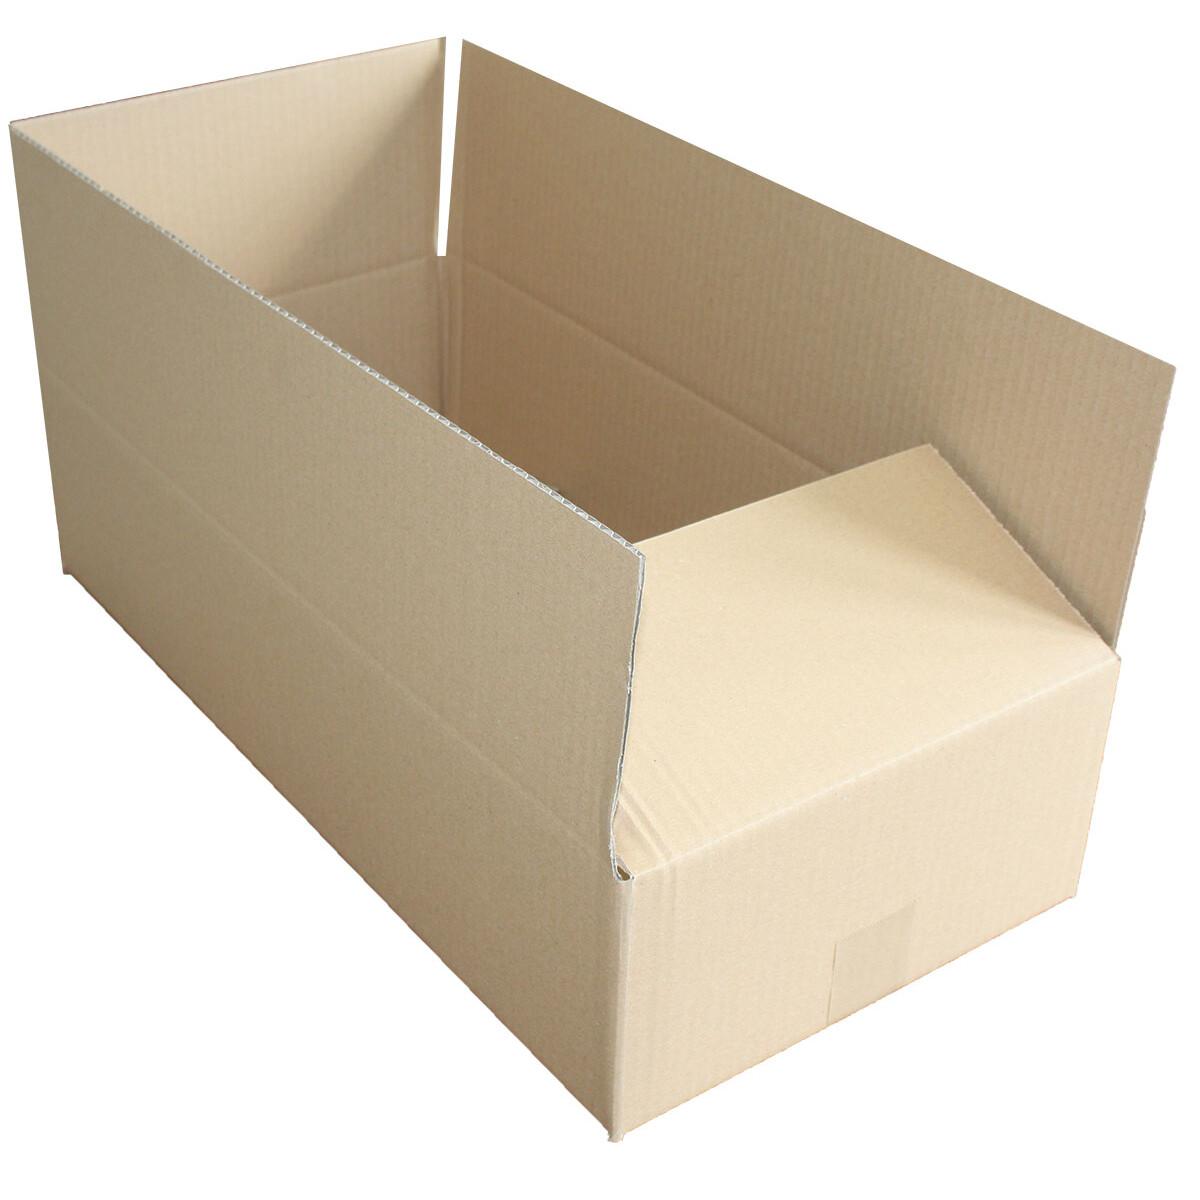 Außenmaß Kartons 350 x 300 x 150 mm 400 Warensendung